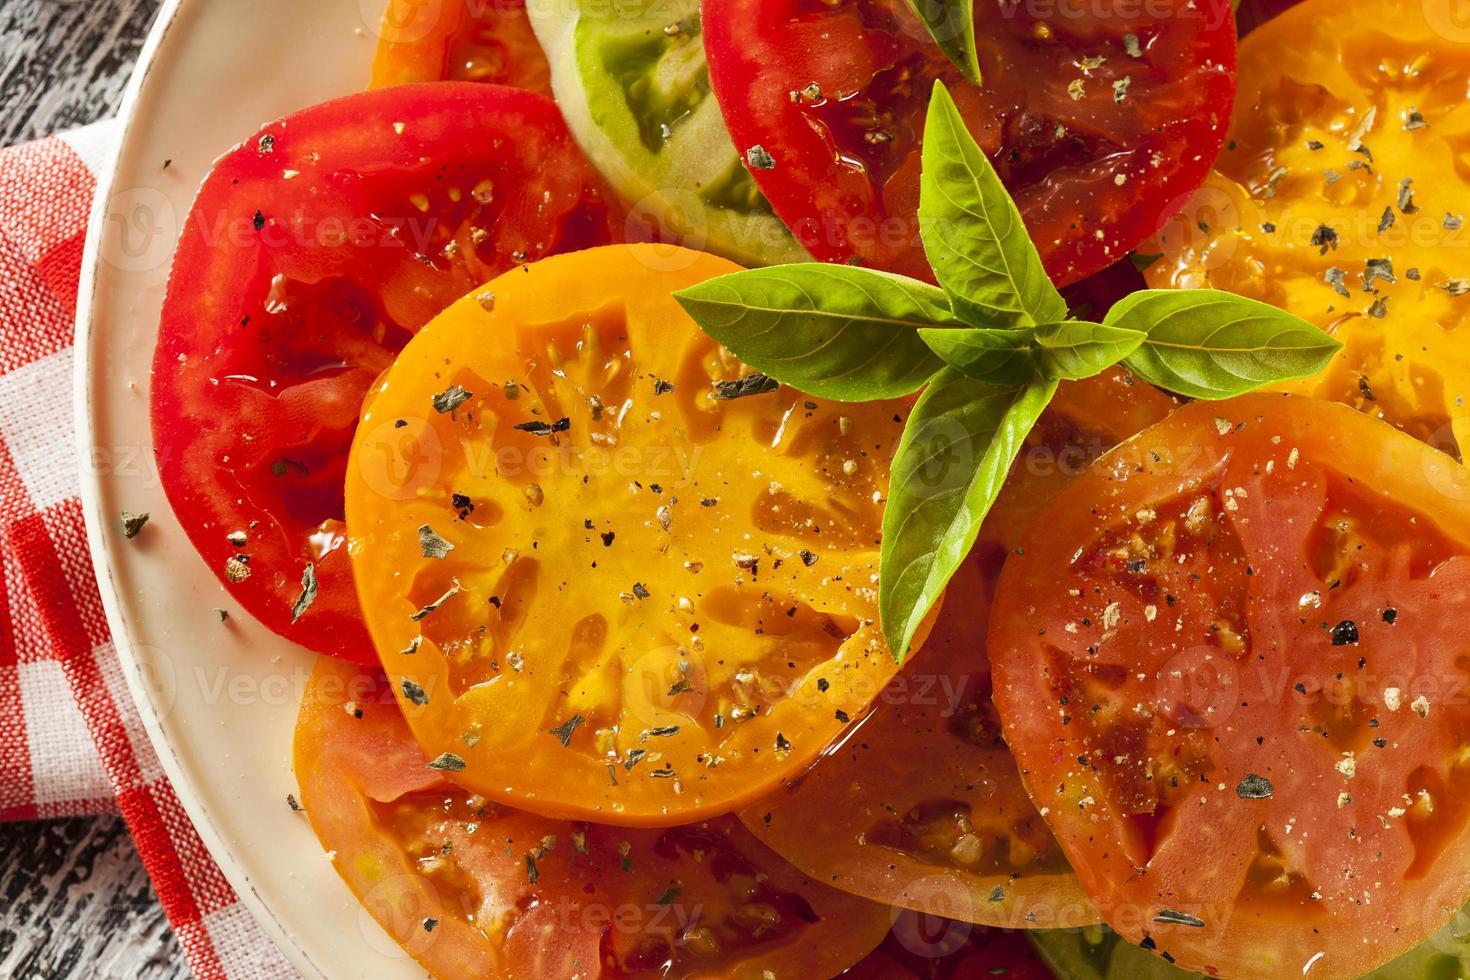 ensalada de tomate saludable foto